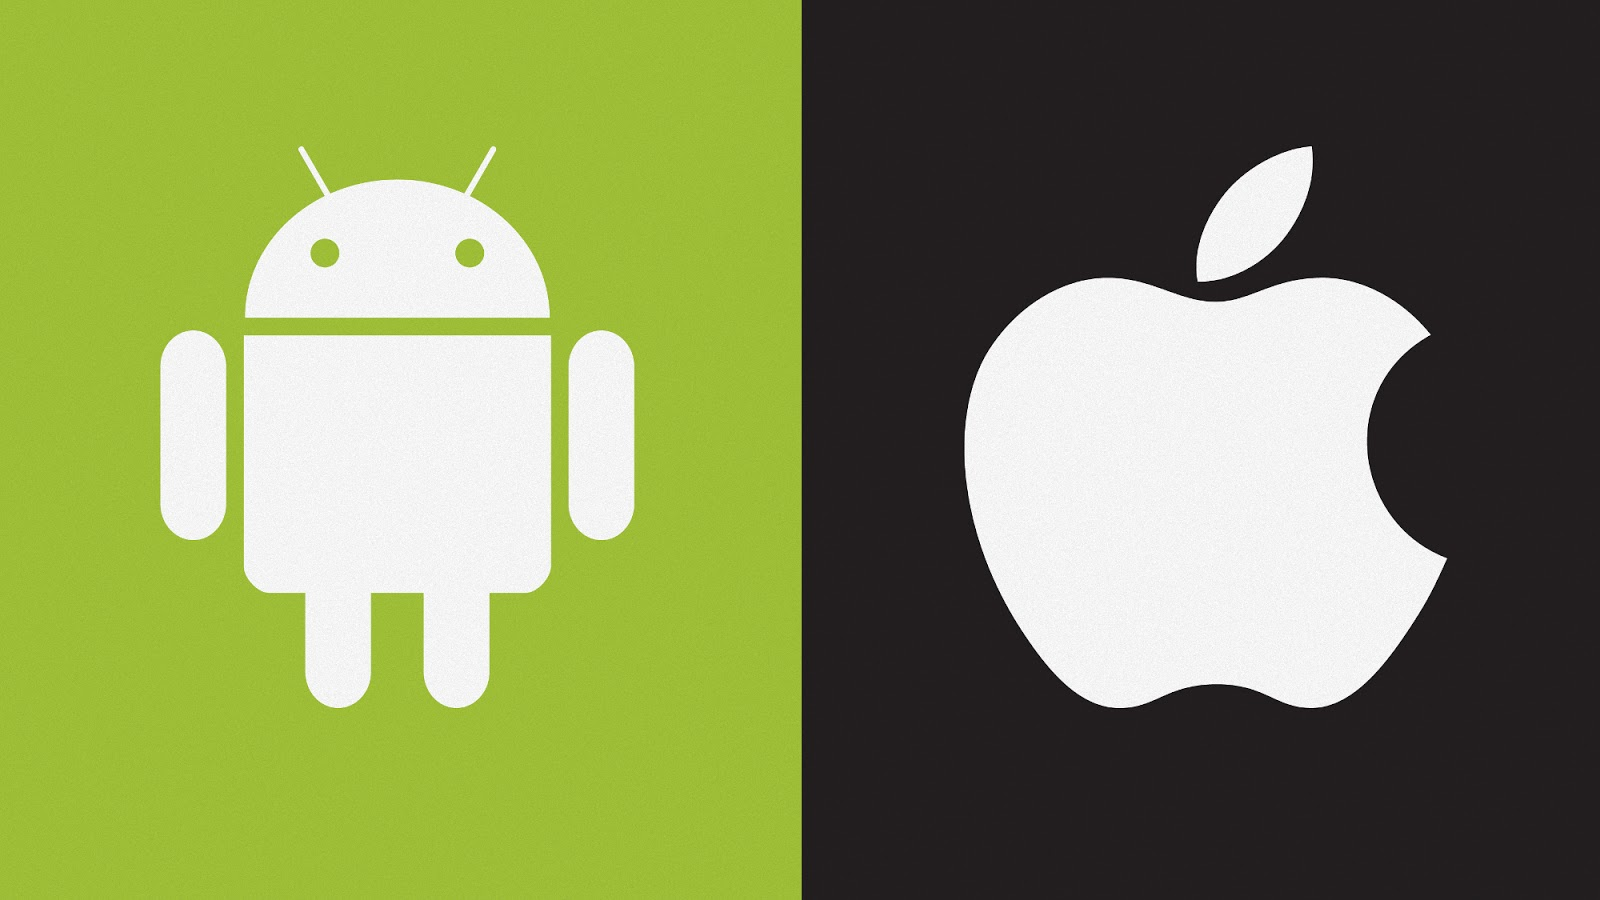 mundo de smartphones